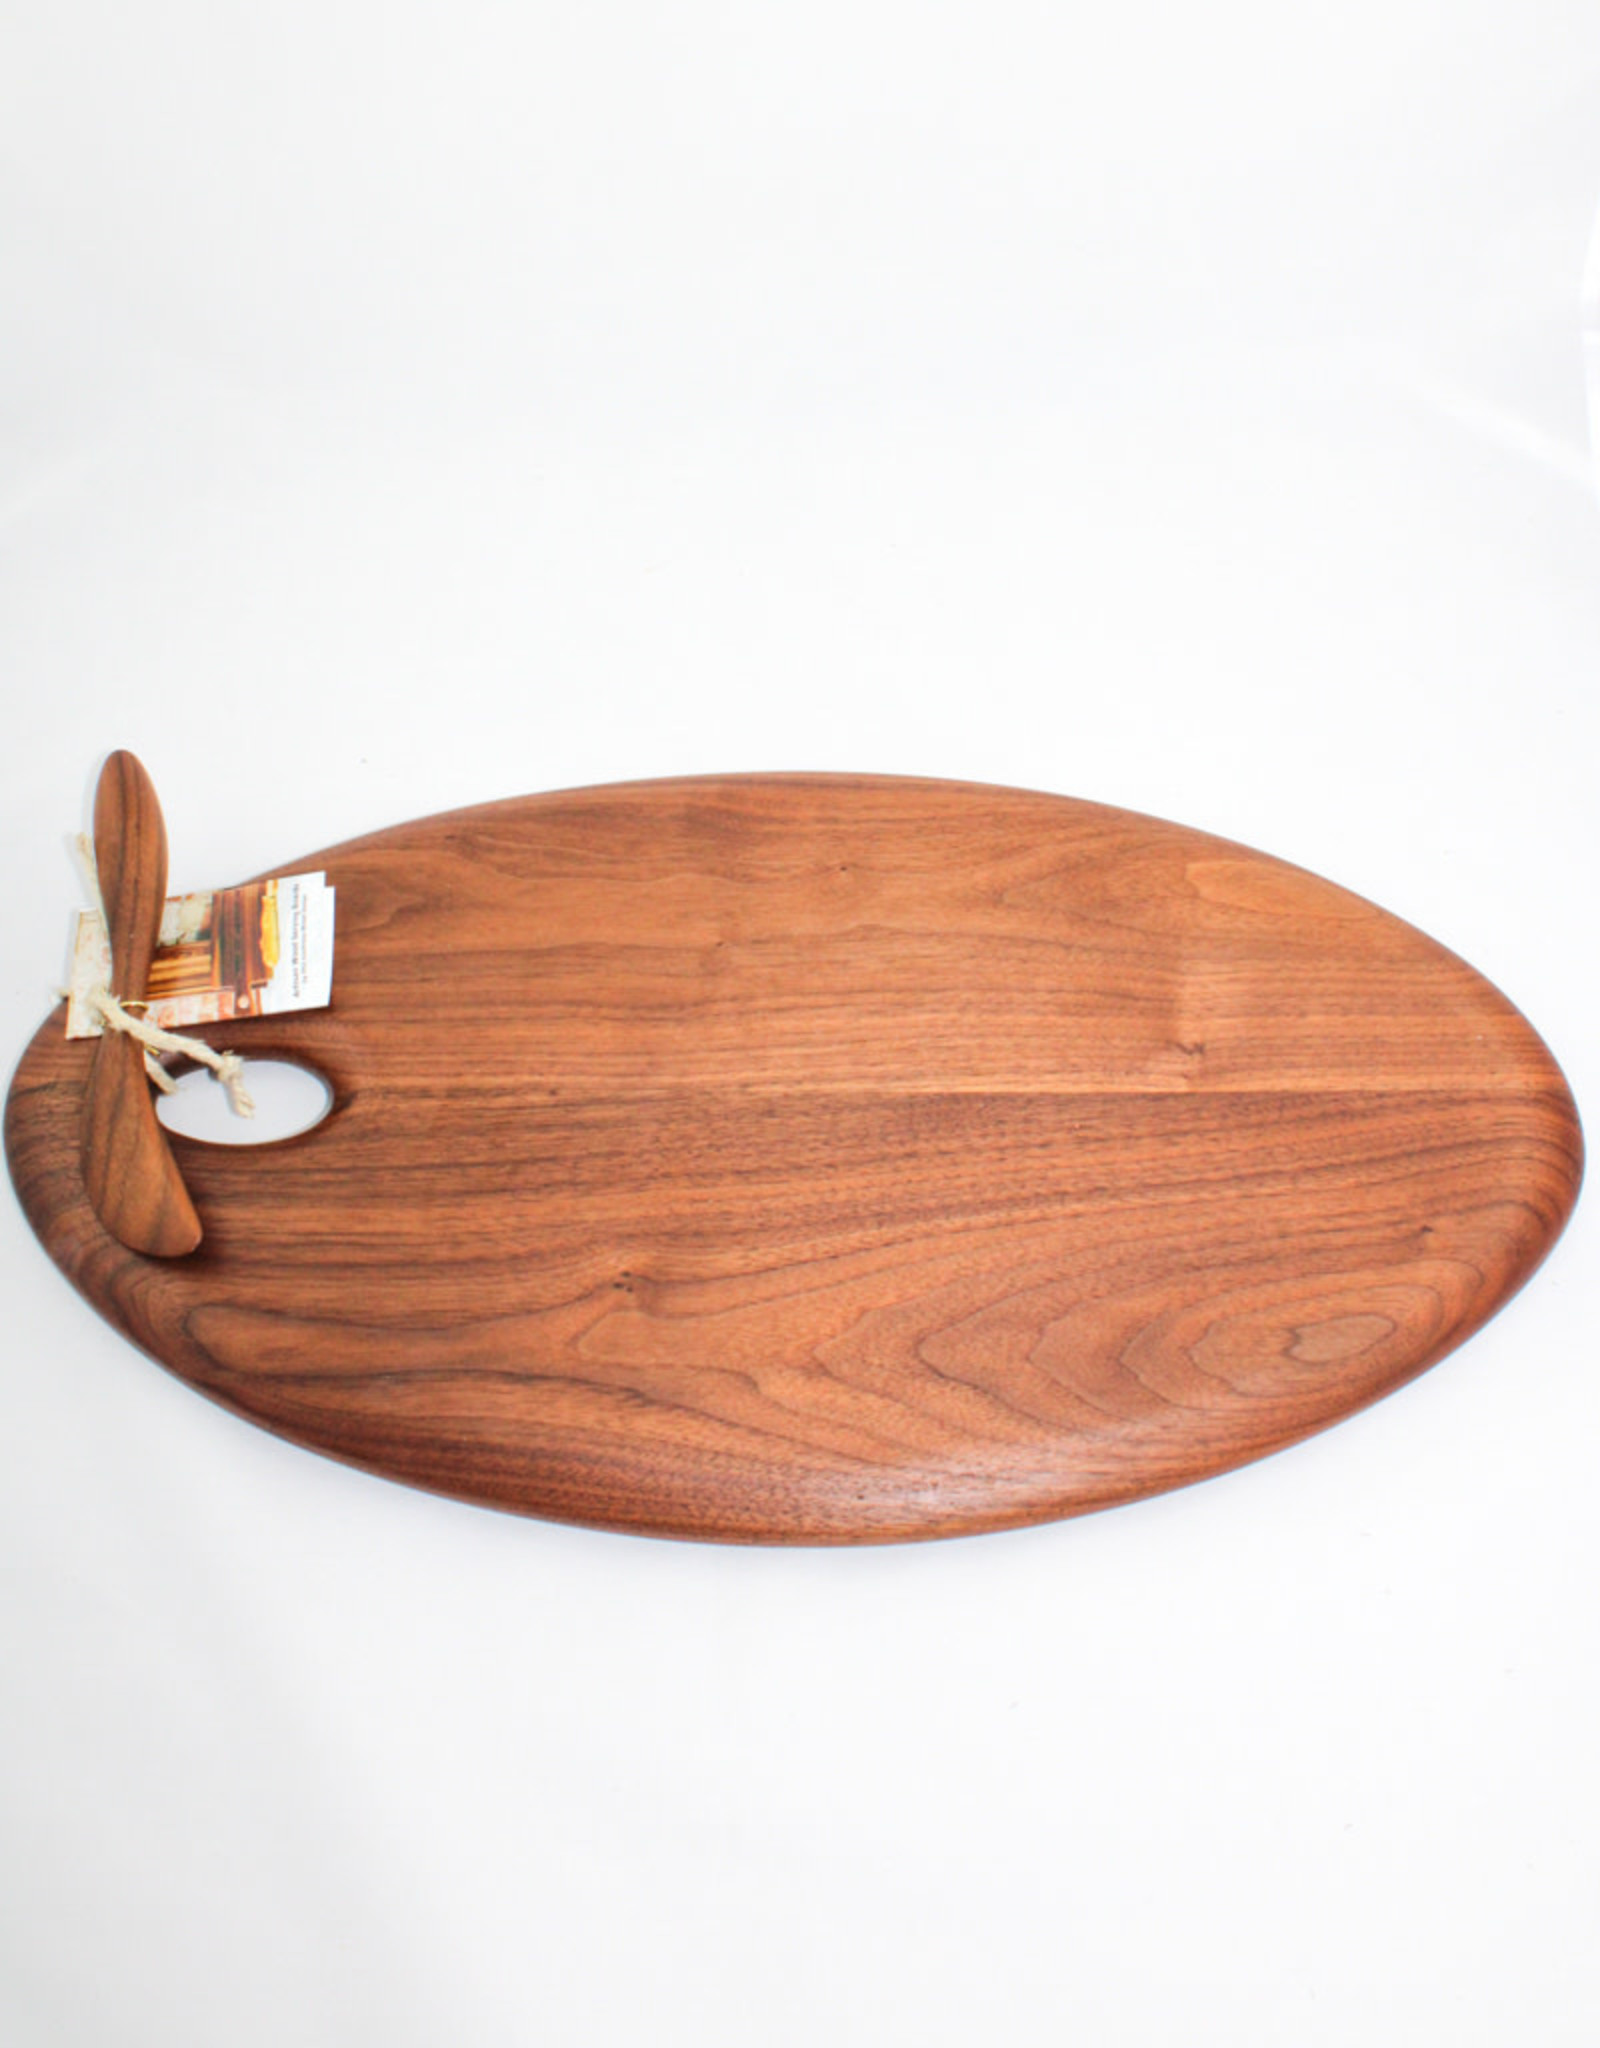 Phil Gautreau Wood Design Artisan Walnut Oval Serving Board